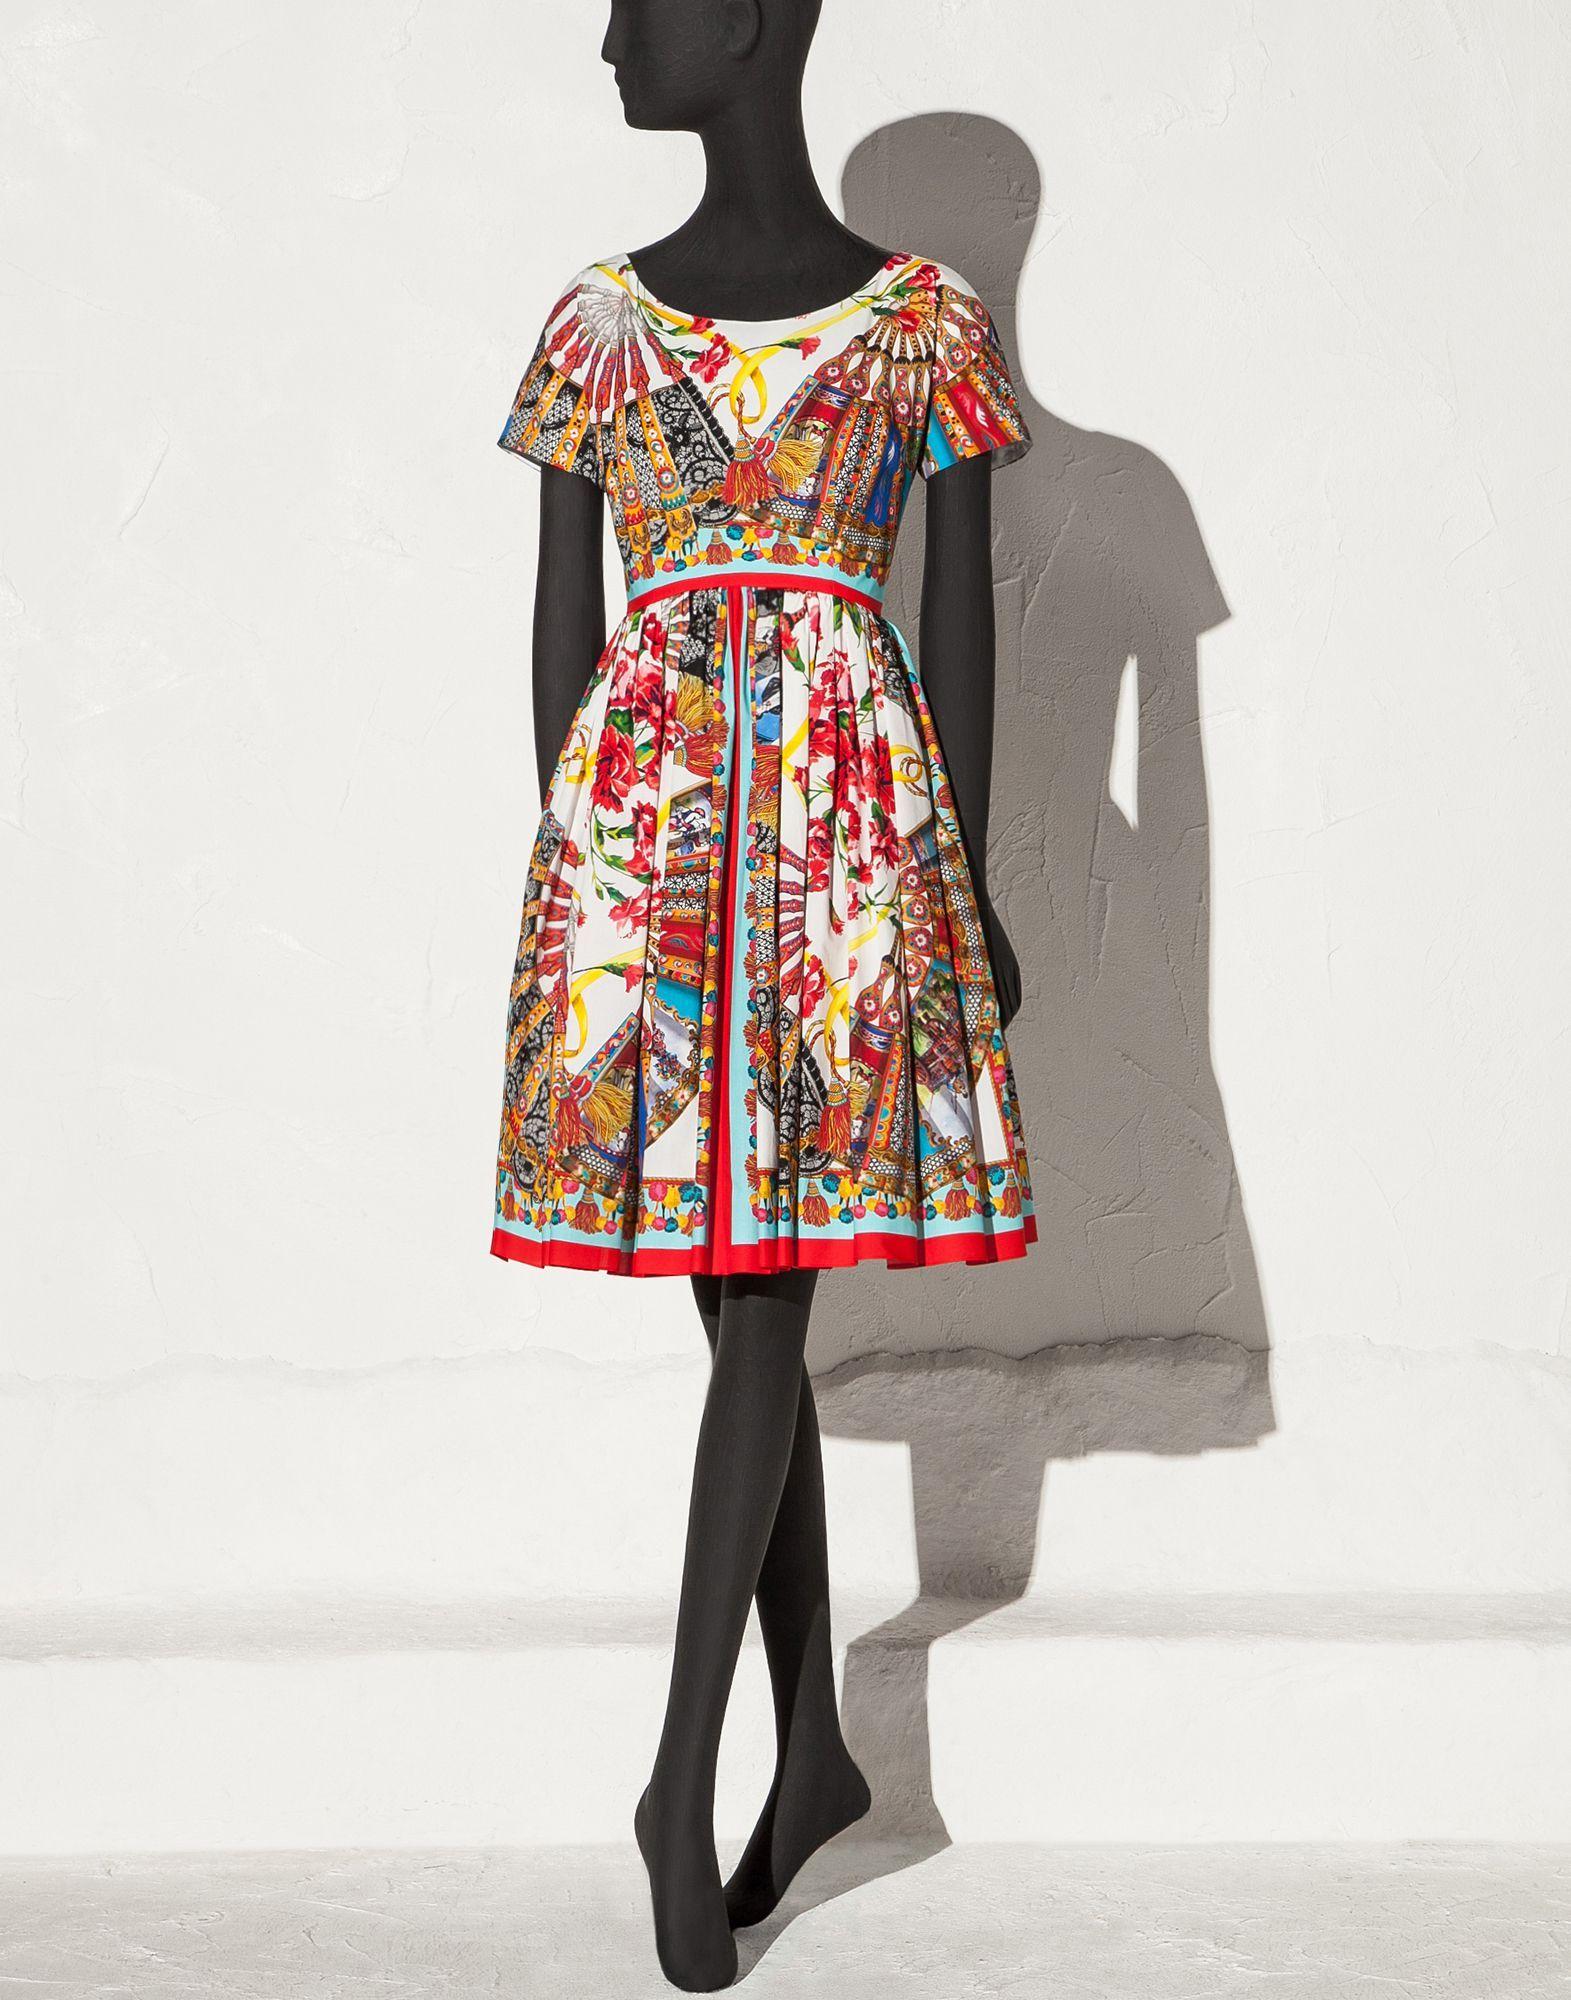 Dolce&Gabbana|F6PR4T-FP5IJ|Vestiti longuette|Vestiti